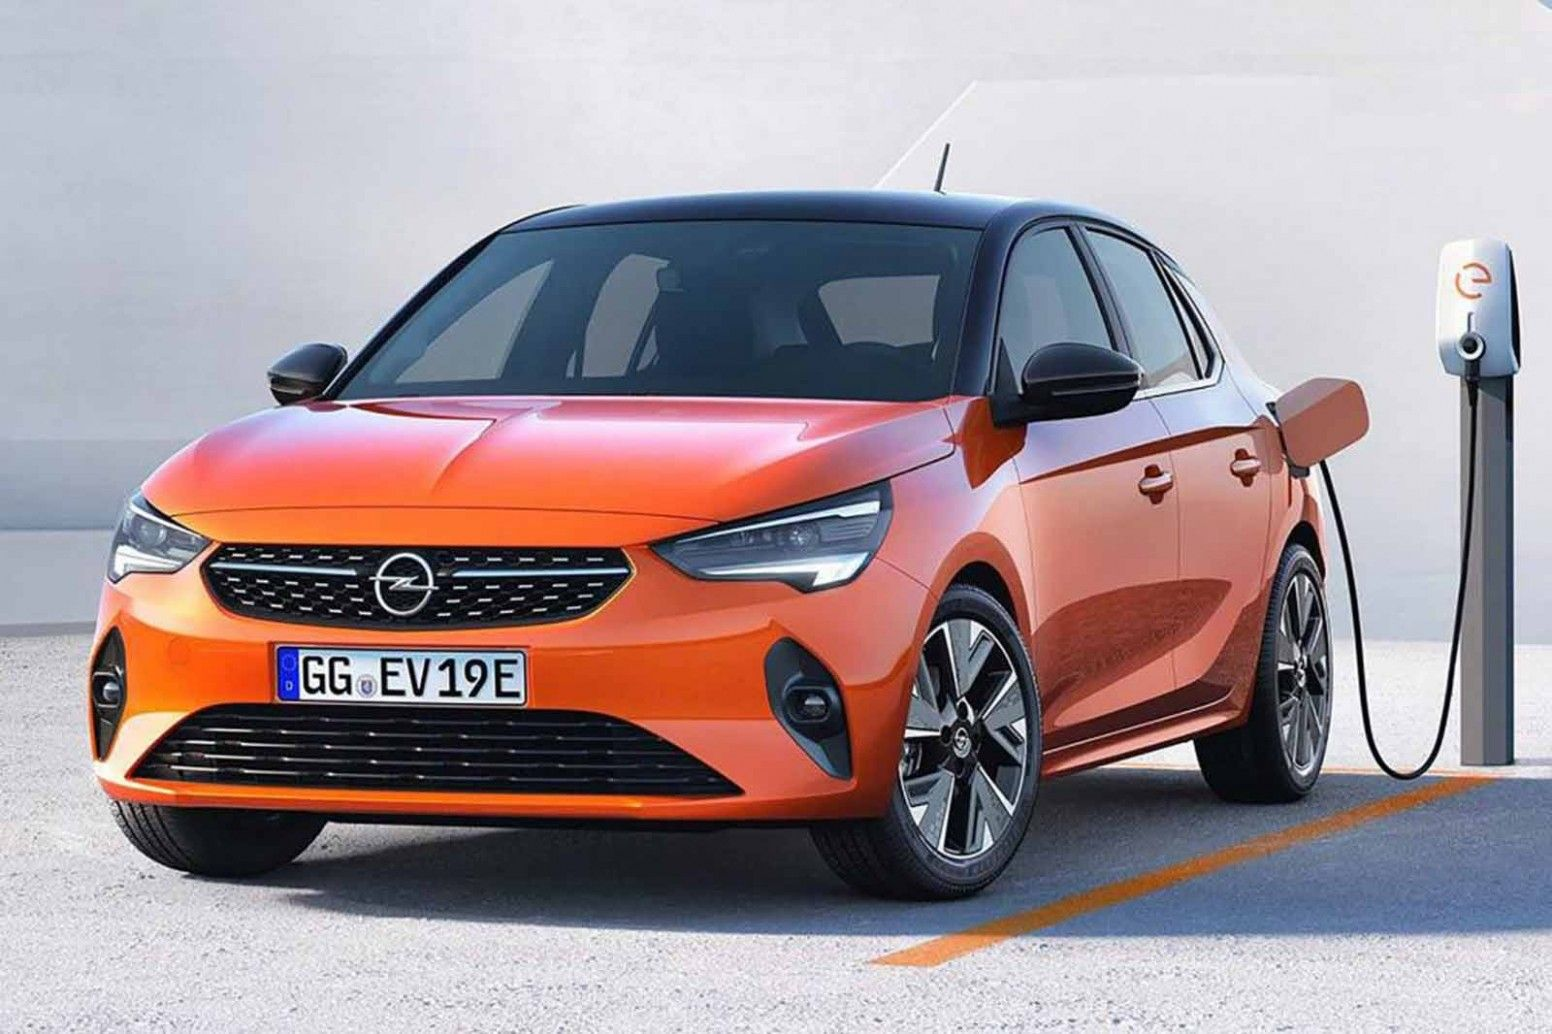 2020 Yeni Opel Astra Sedan New Opel Corsa Opel Vectra City Car